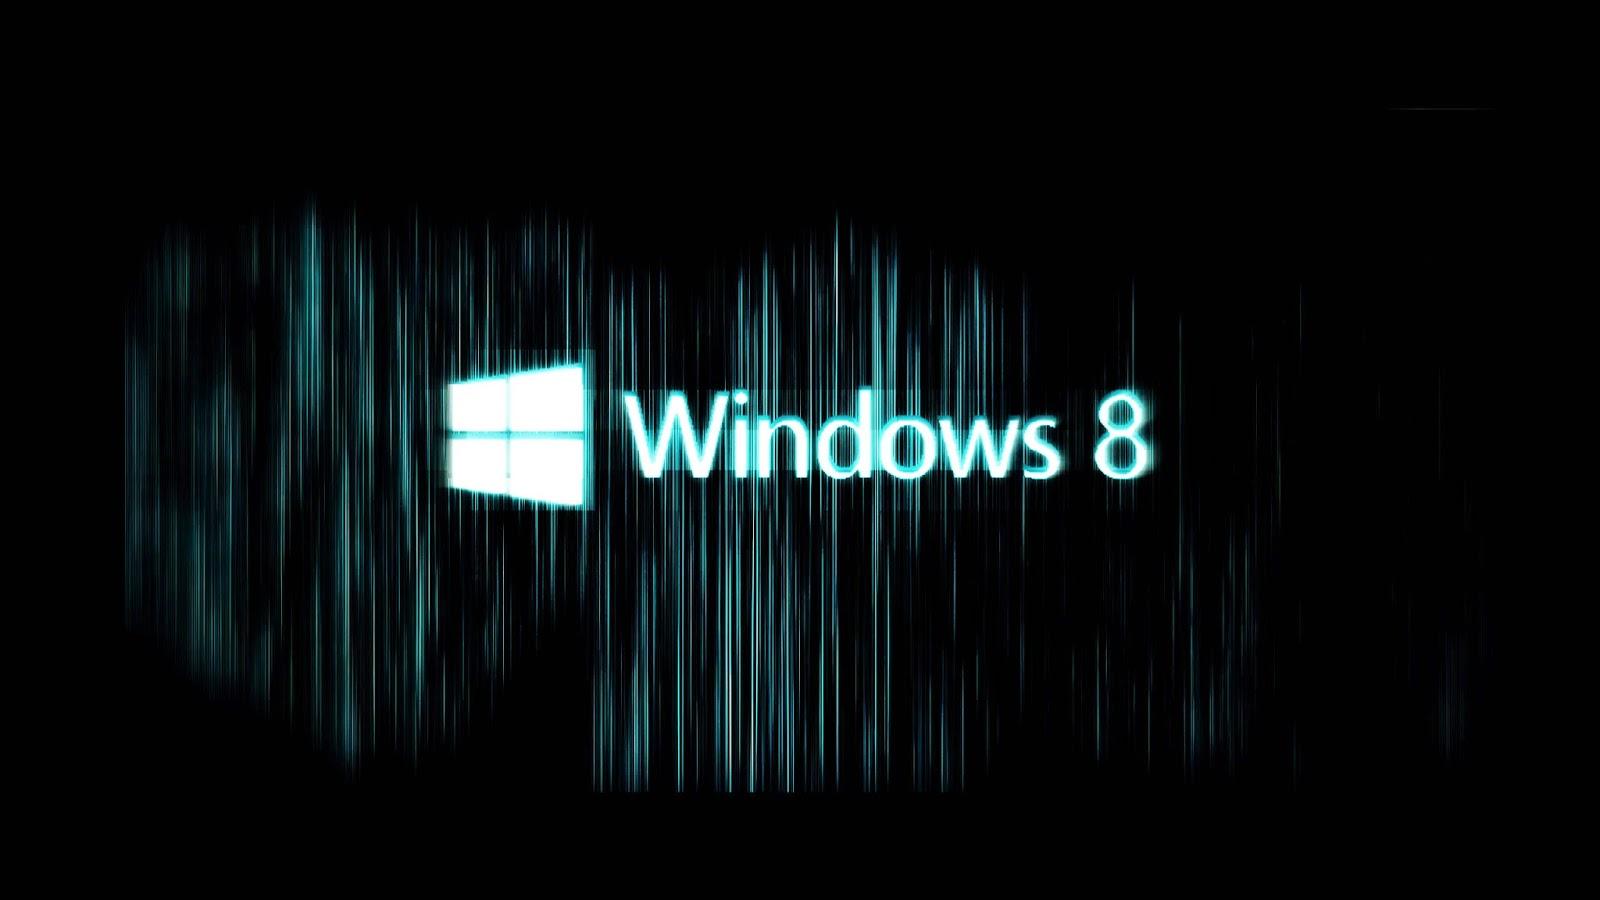 Dark-BG-windows-8-professional-OS-wallpaper-for-students-college.jpg